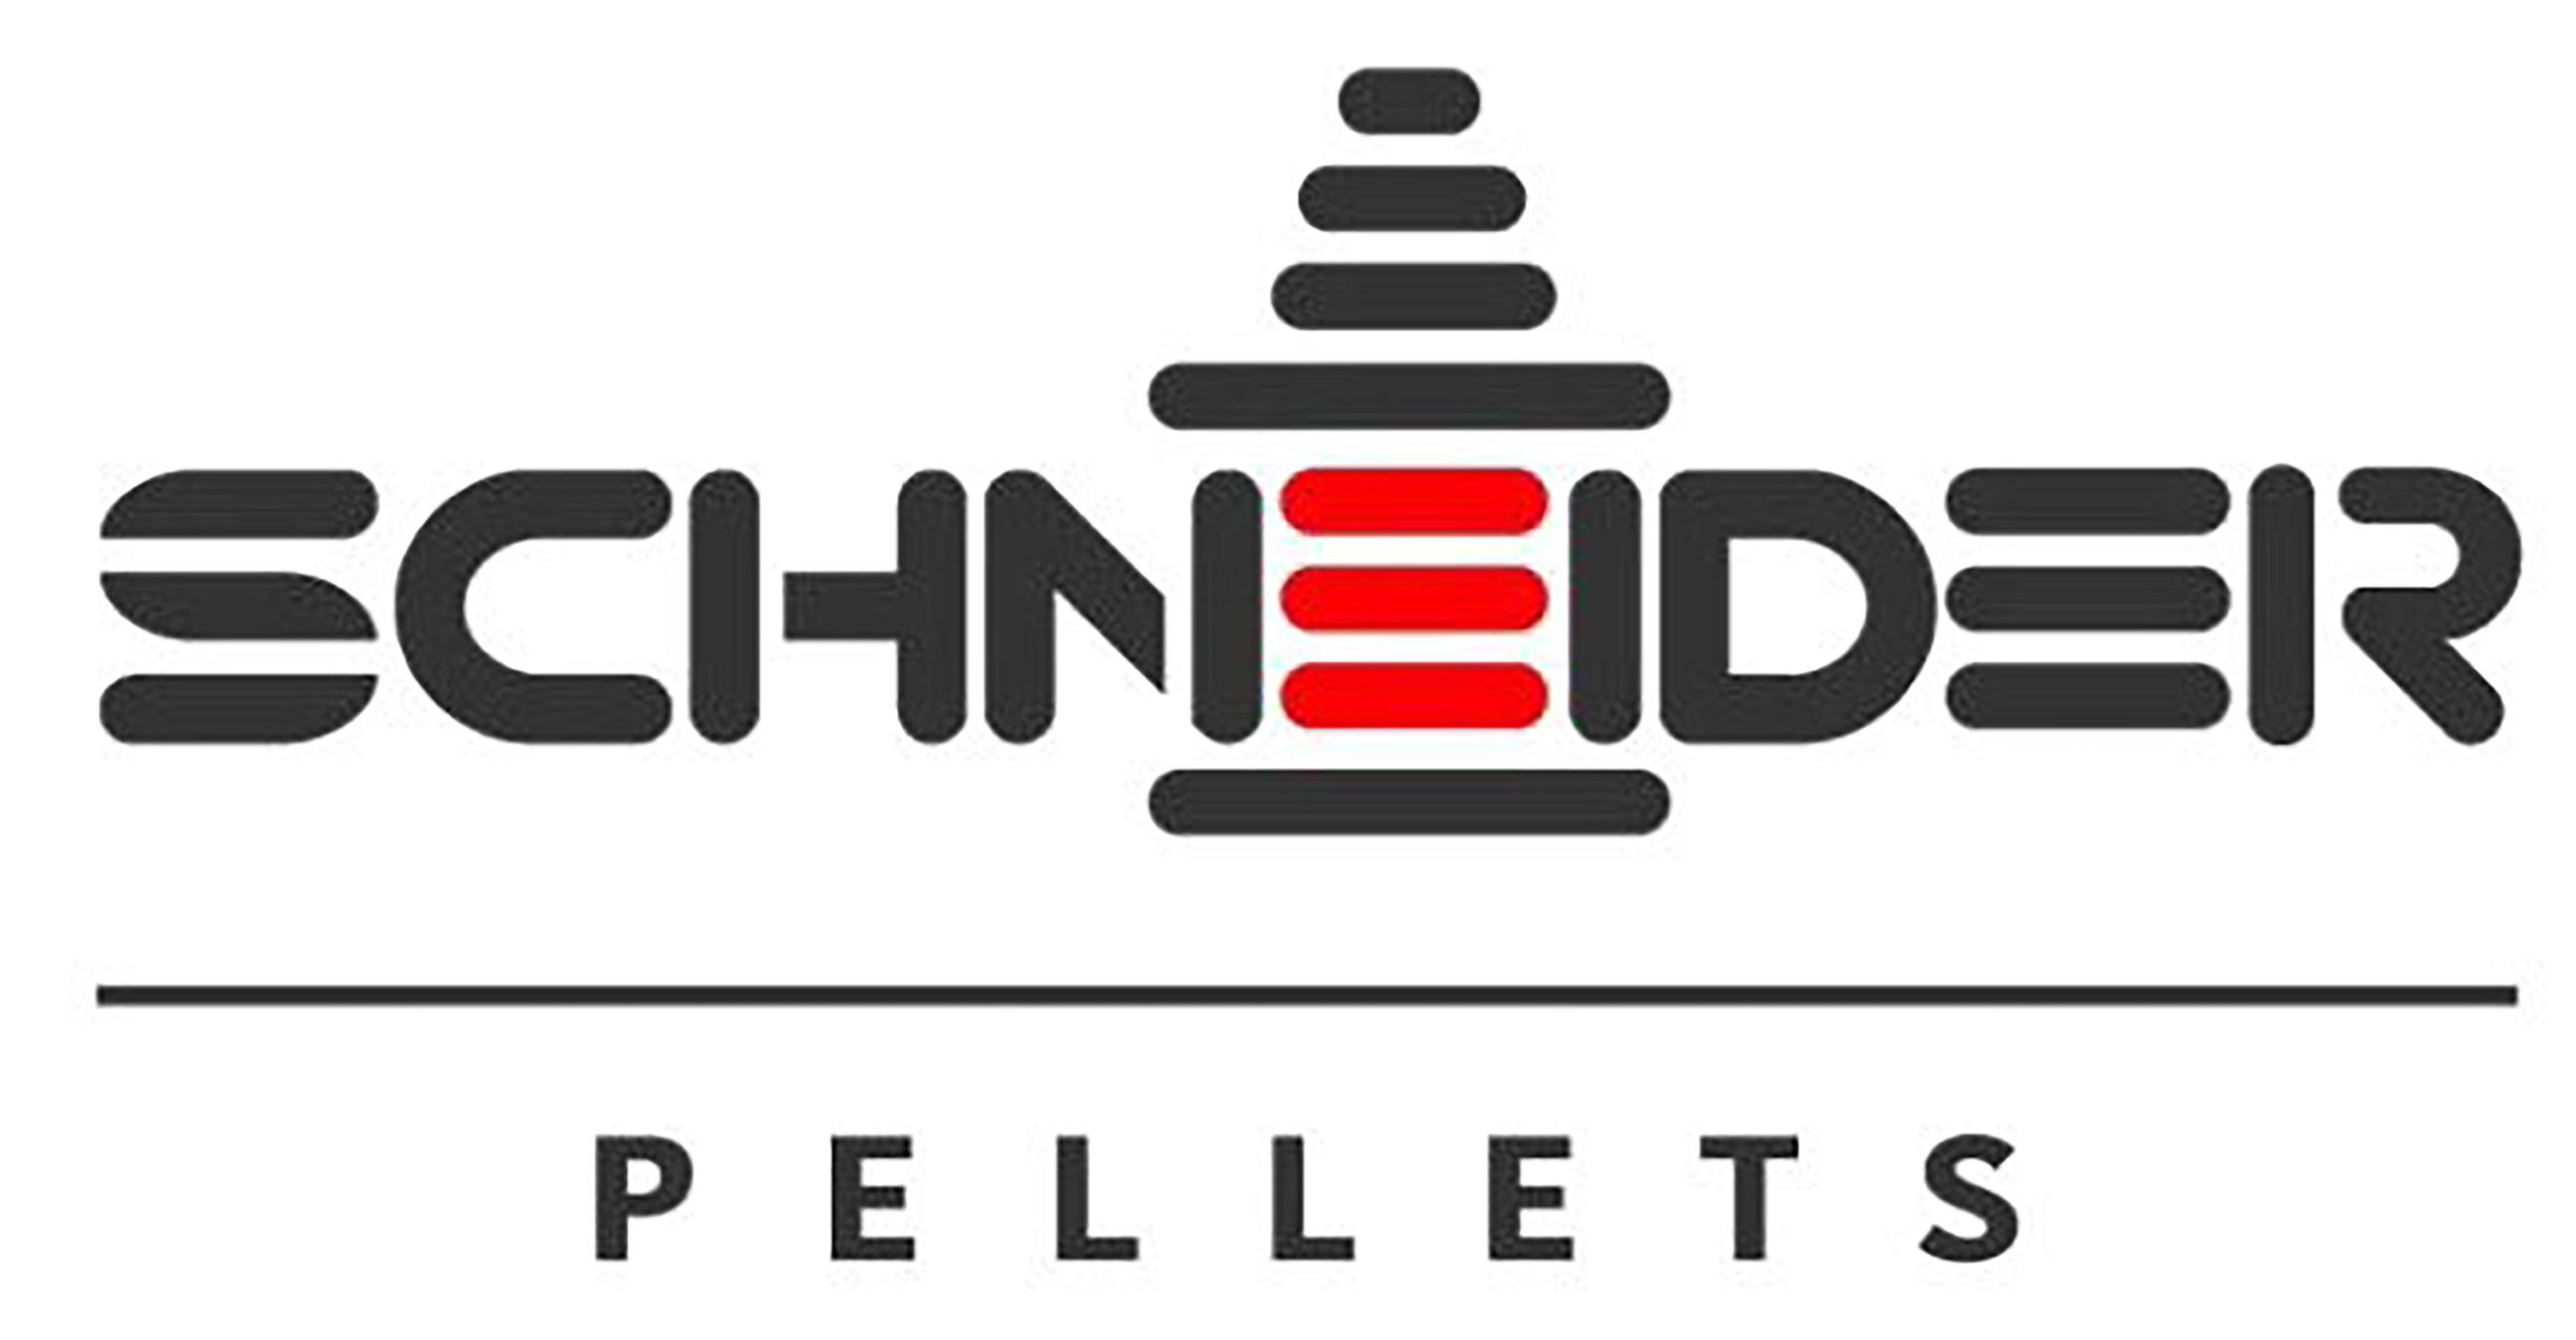 Bildmarke: Schneider pellets